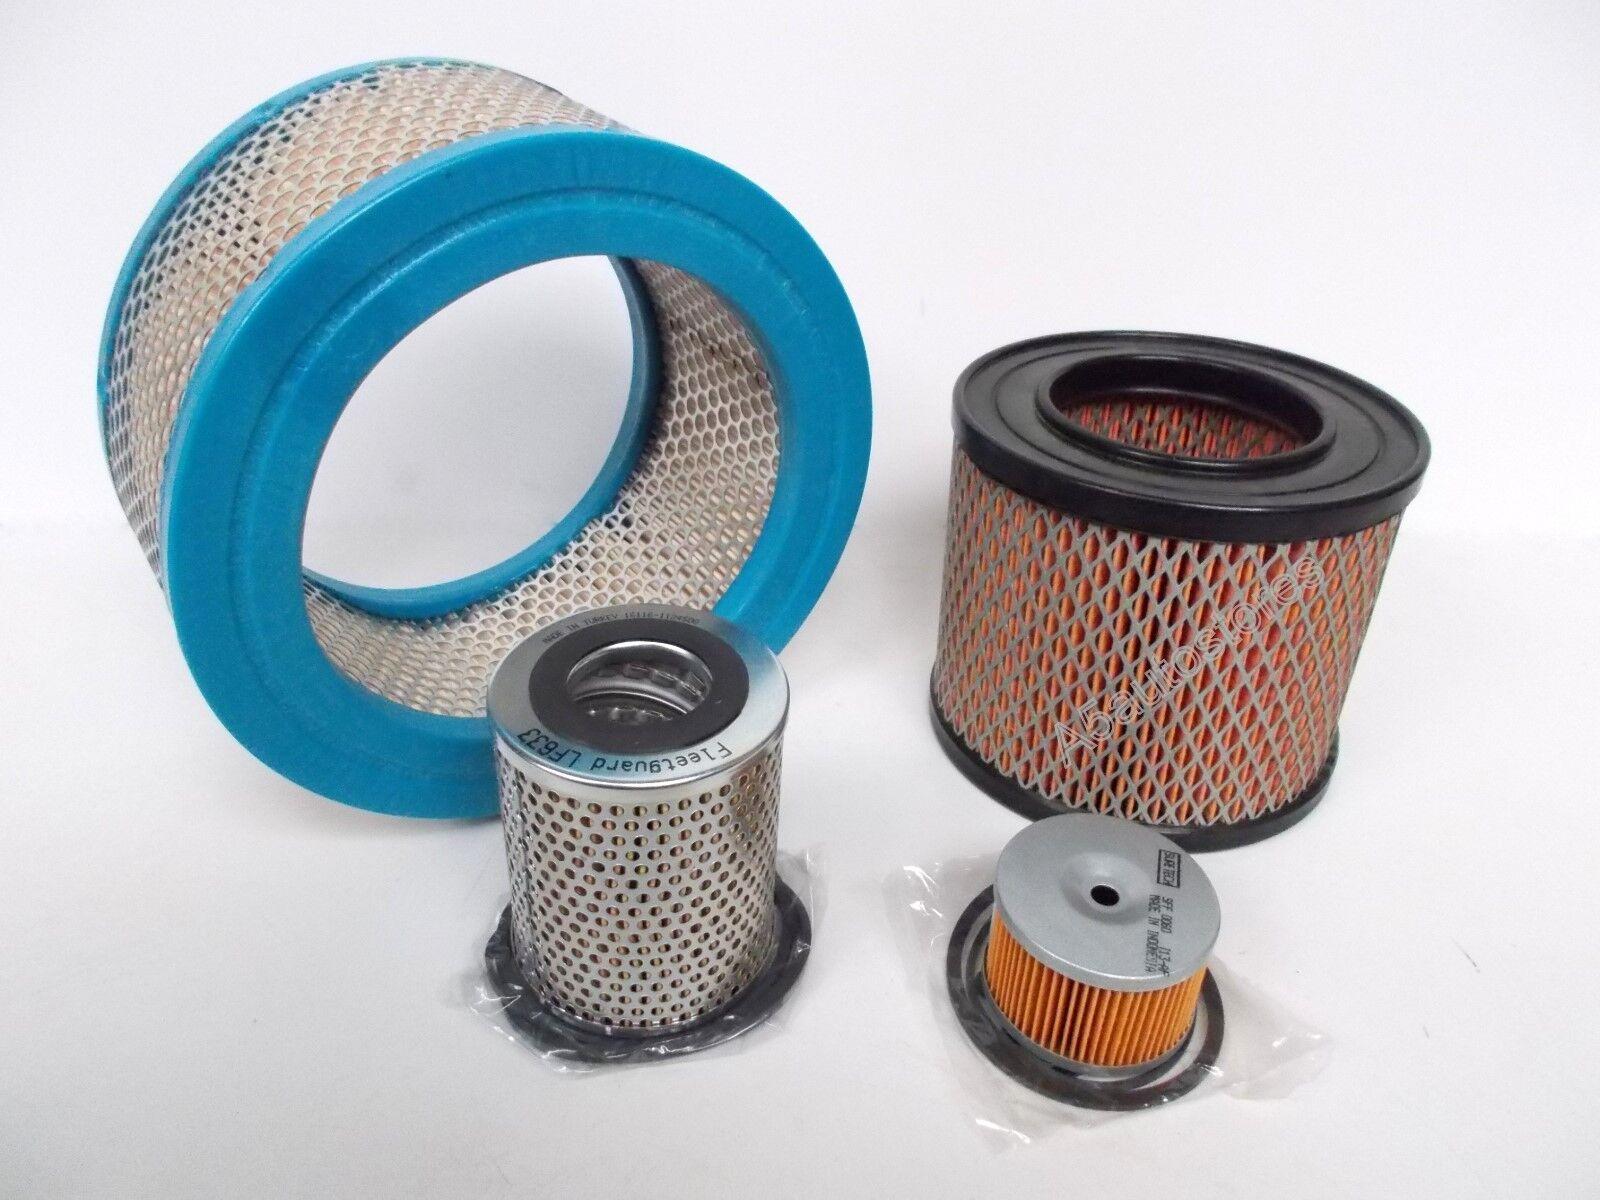 Filter Kit for Lister Petter LD engines - oil filter, fuel filter & air filter